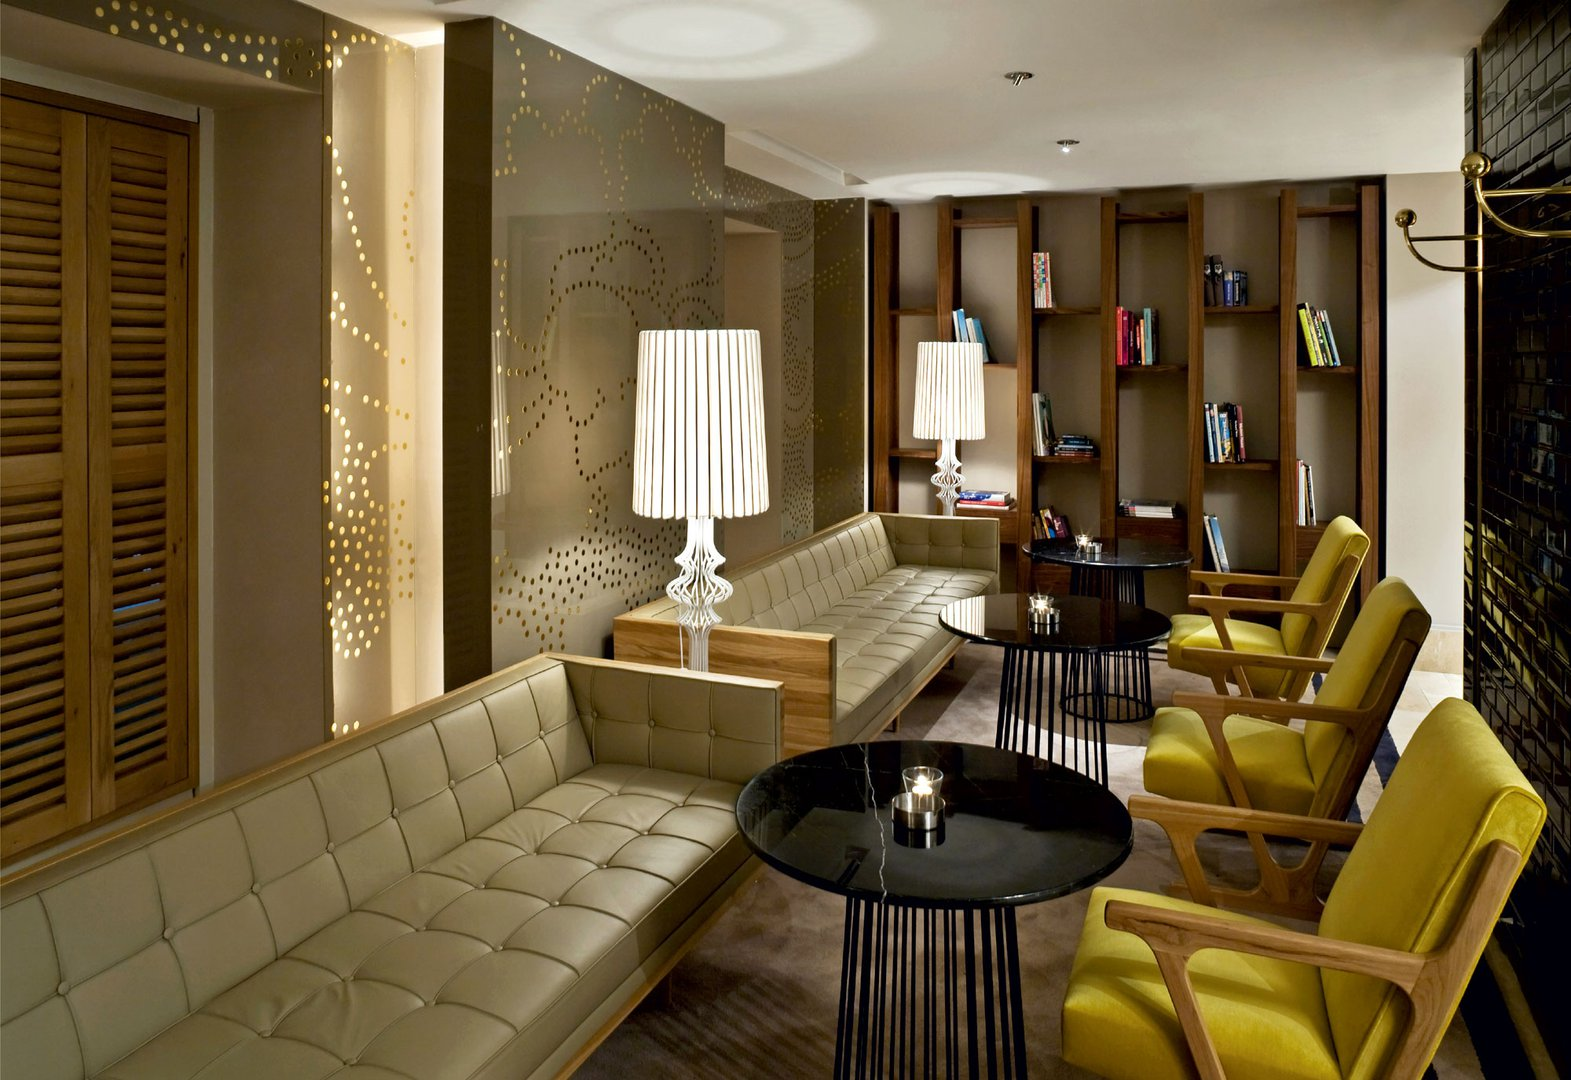 Hotel witt istanbul buti na oaza sredi velemesta dekor for Dekor hotel istanbul